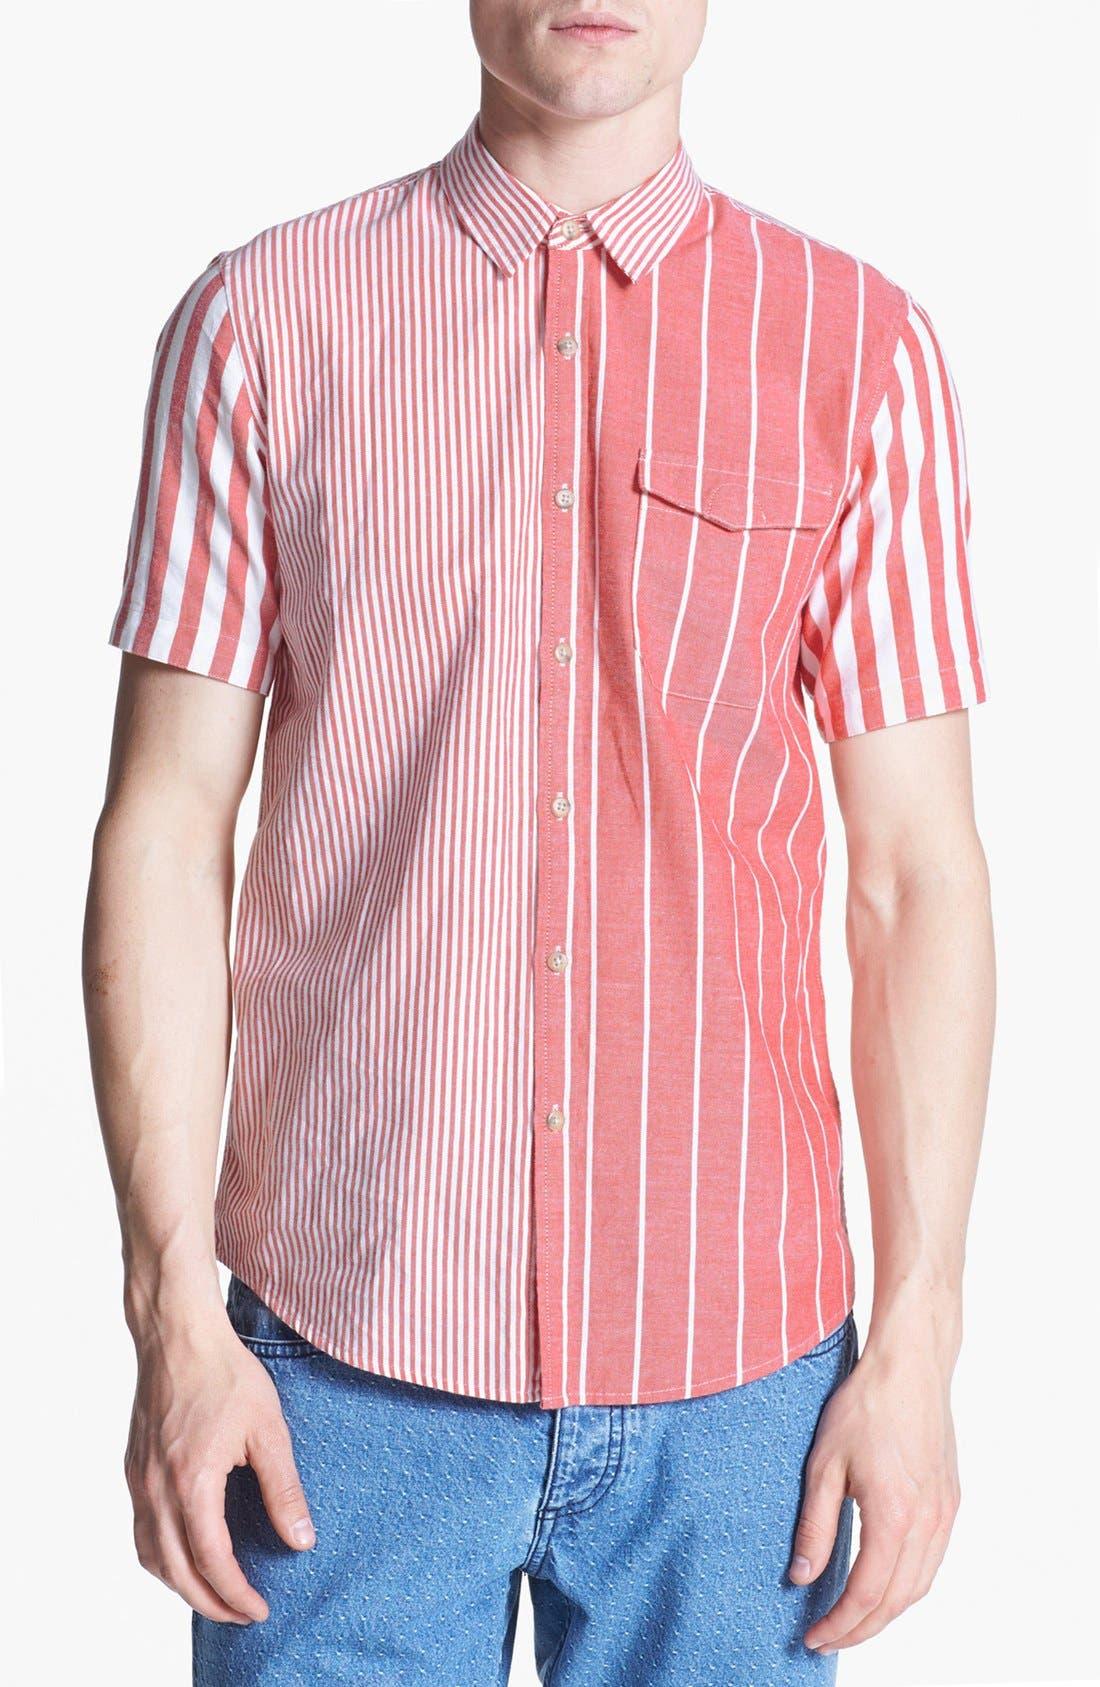 Alternate Image 1 Selected - Topman Mixed Stripe Panel Shirt